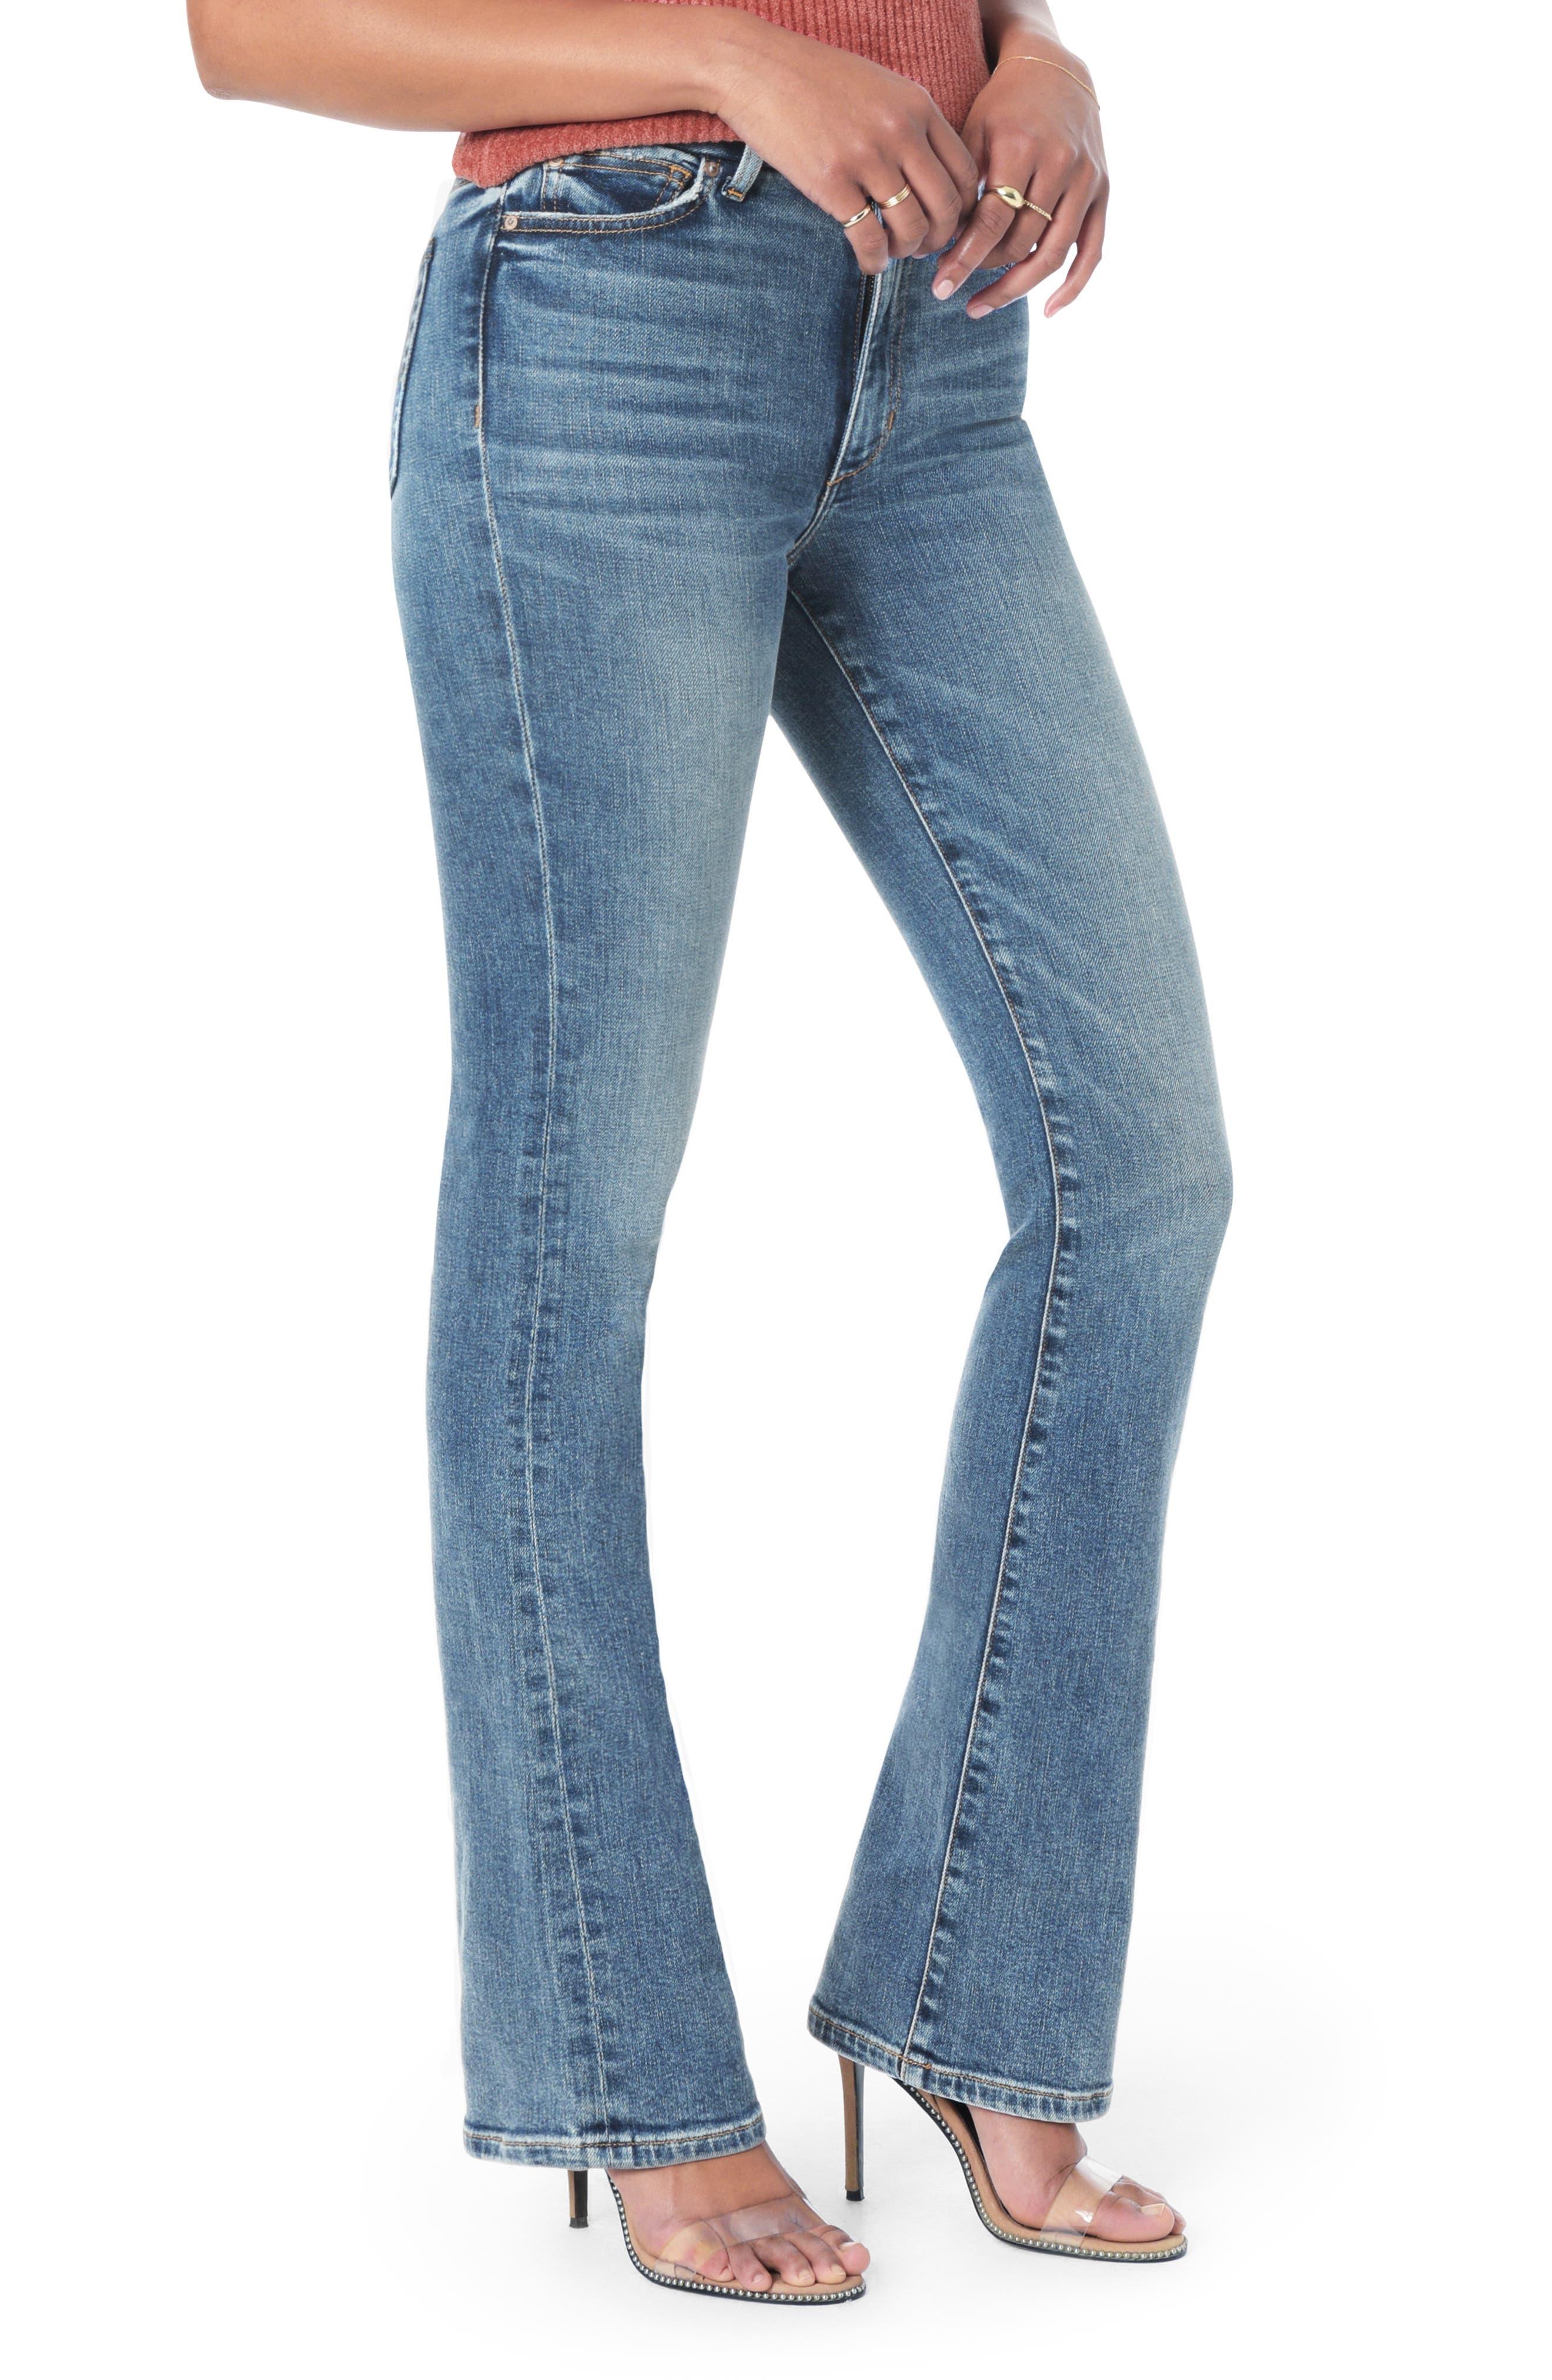 Honey Curvy High Waist Bootcut Jeans,                             Main thumbnail 1, color,                             CHRISELLE